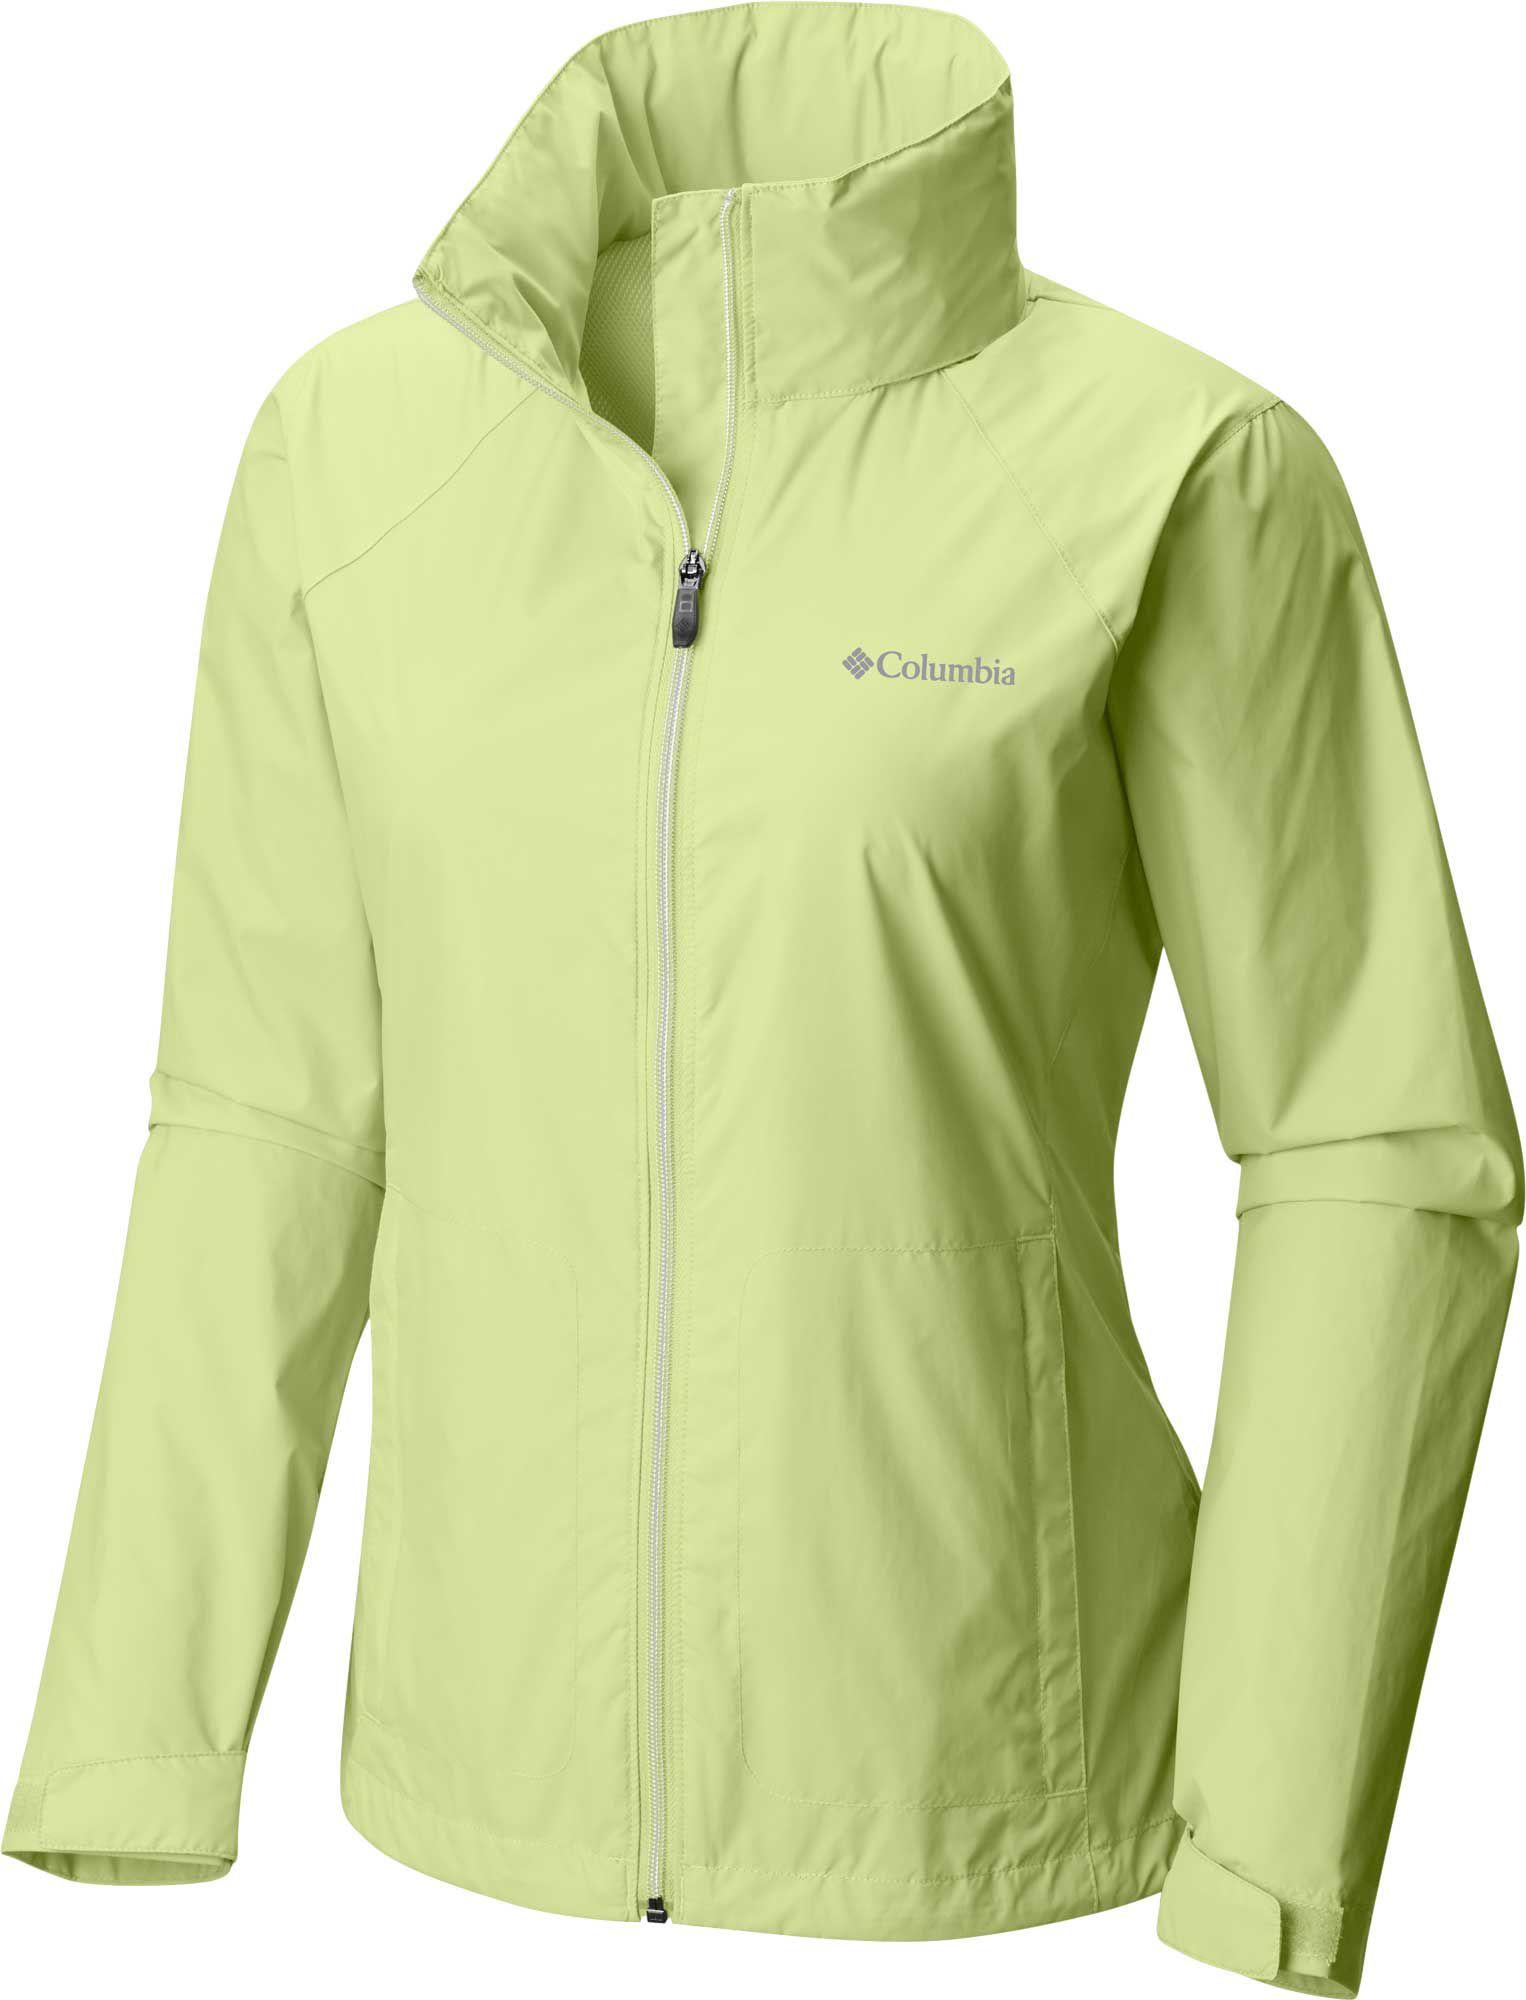 Columbia Women's Switchback Rain Jacket   DICK'S Sporting Goods